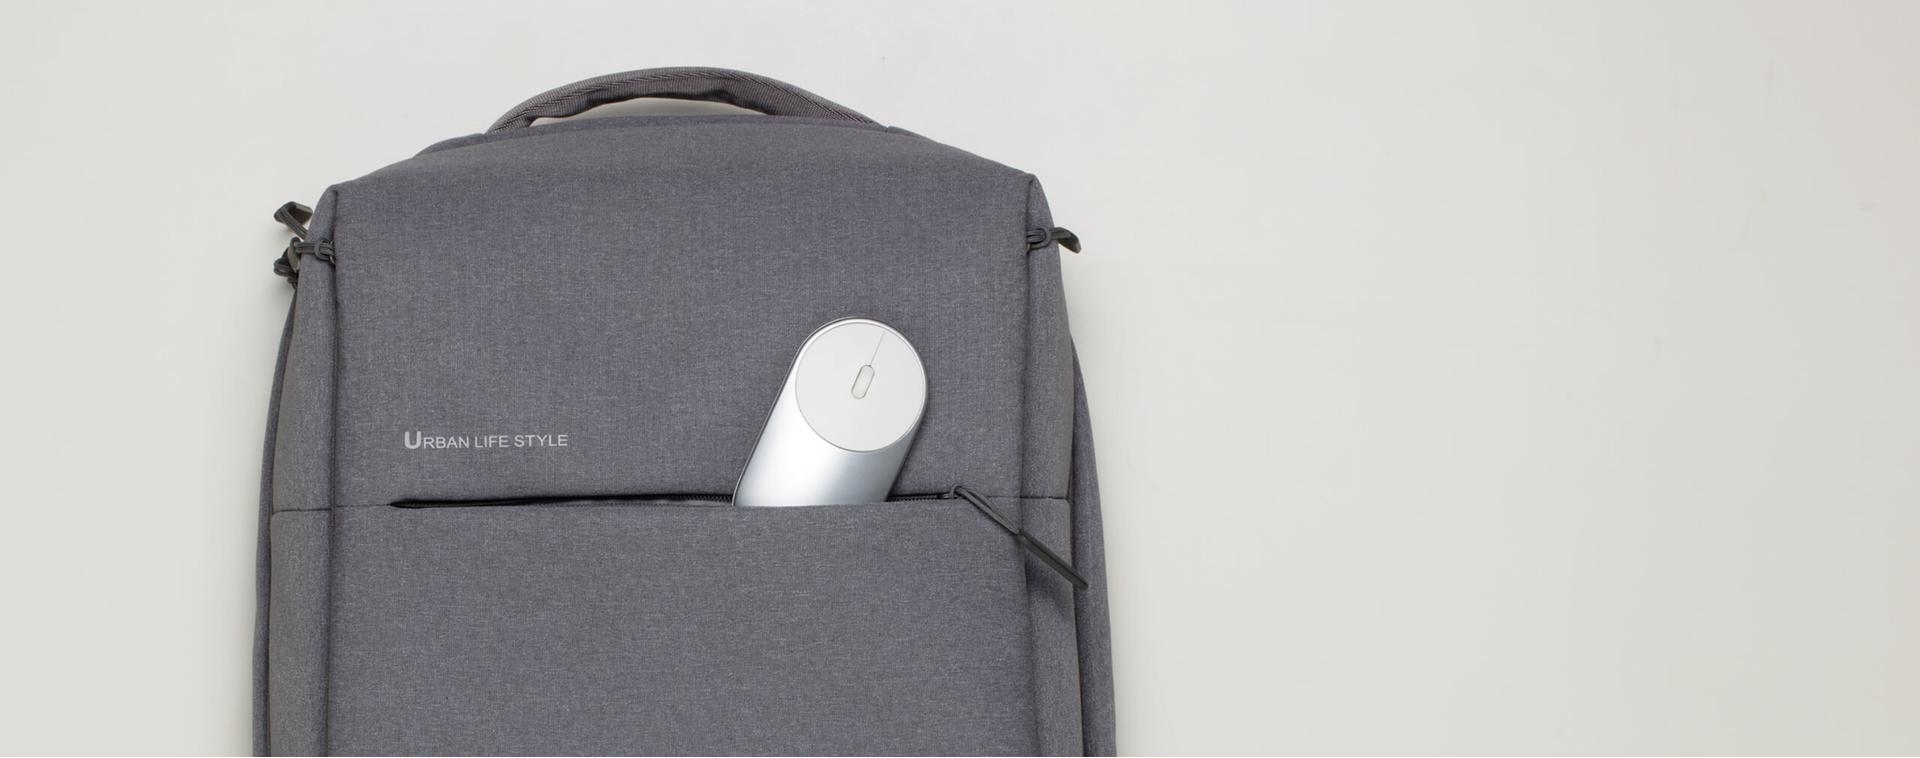 Xiaomi Mi Portable egér, arany